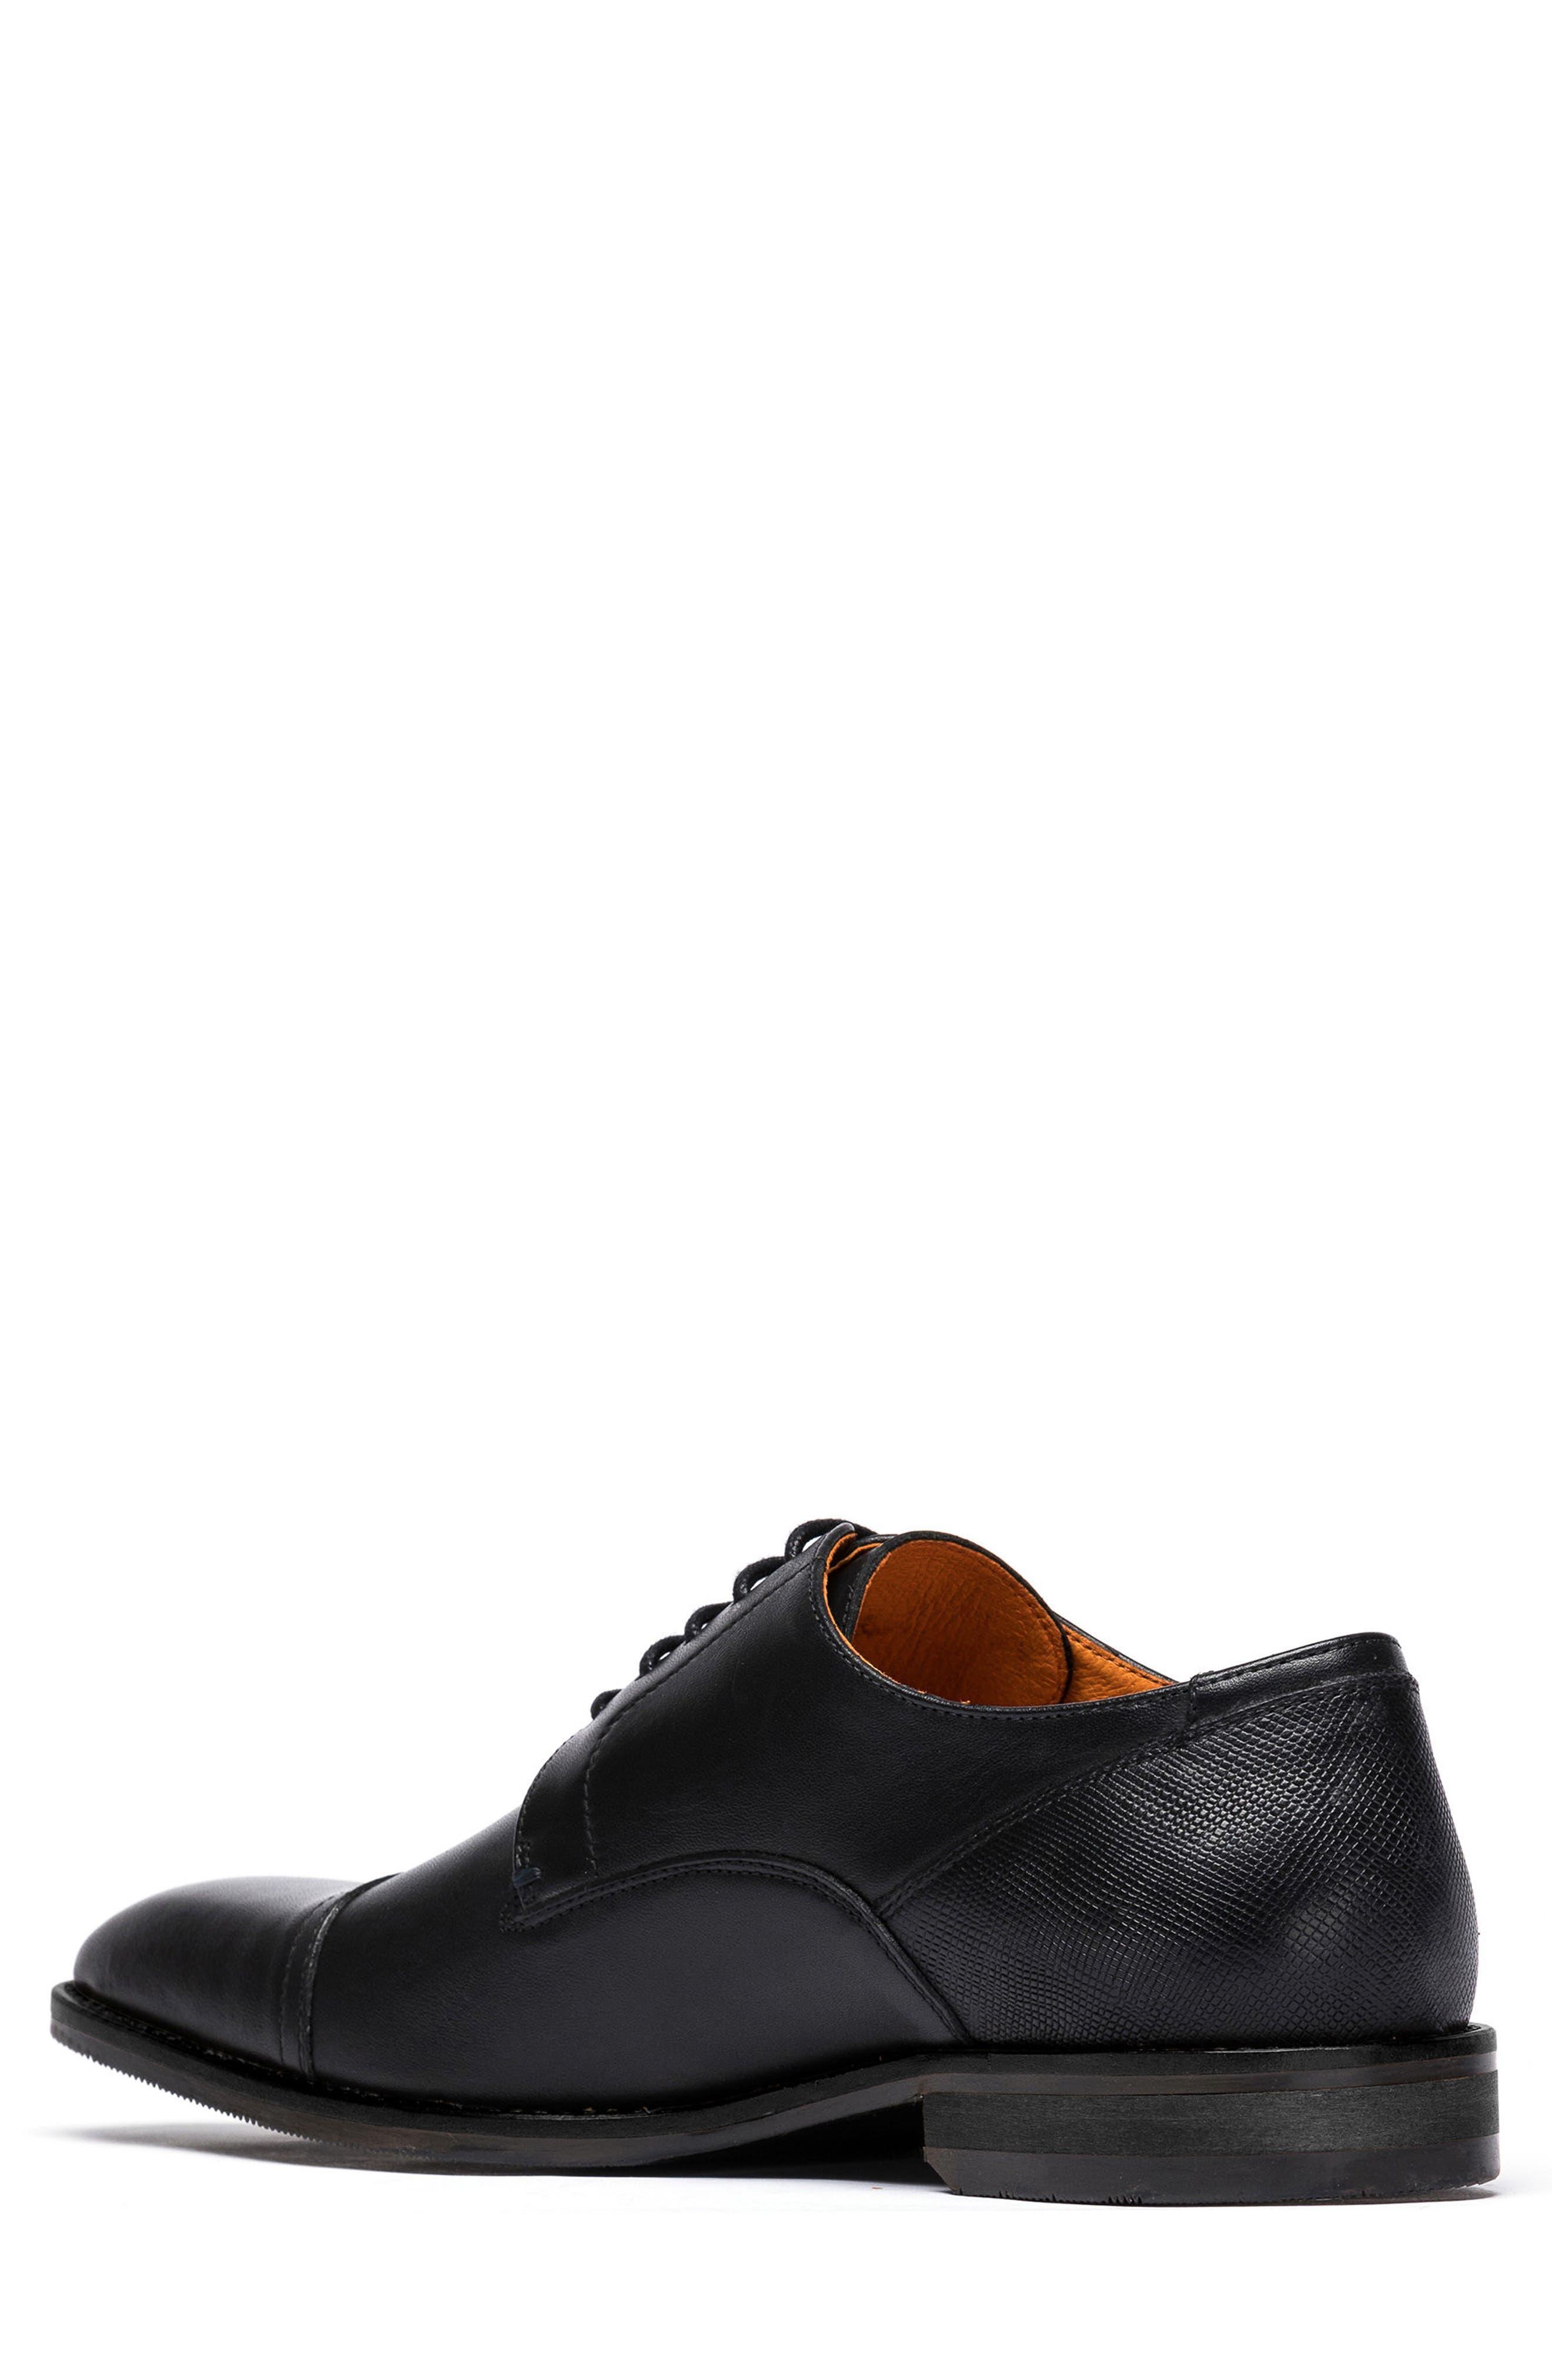 Franklin Cap Toe Derby,                             Alternate thumbnail 2, color,                             Nero Leather